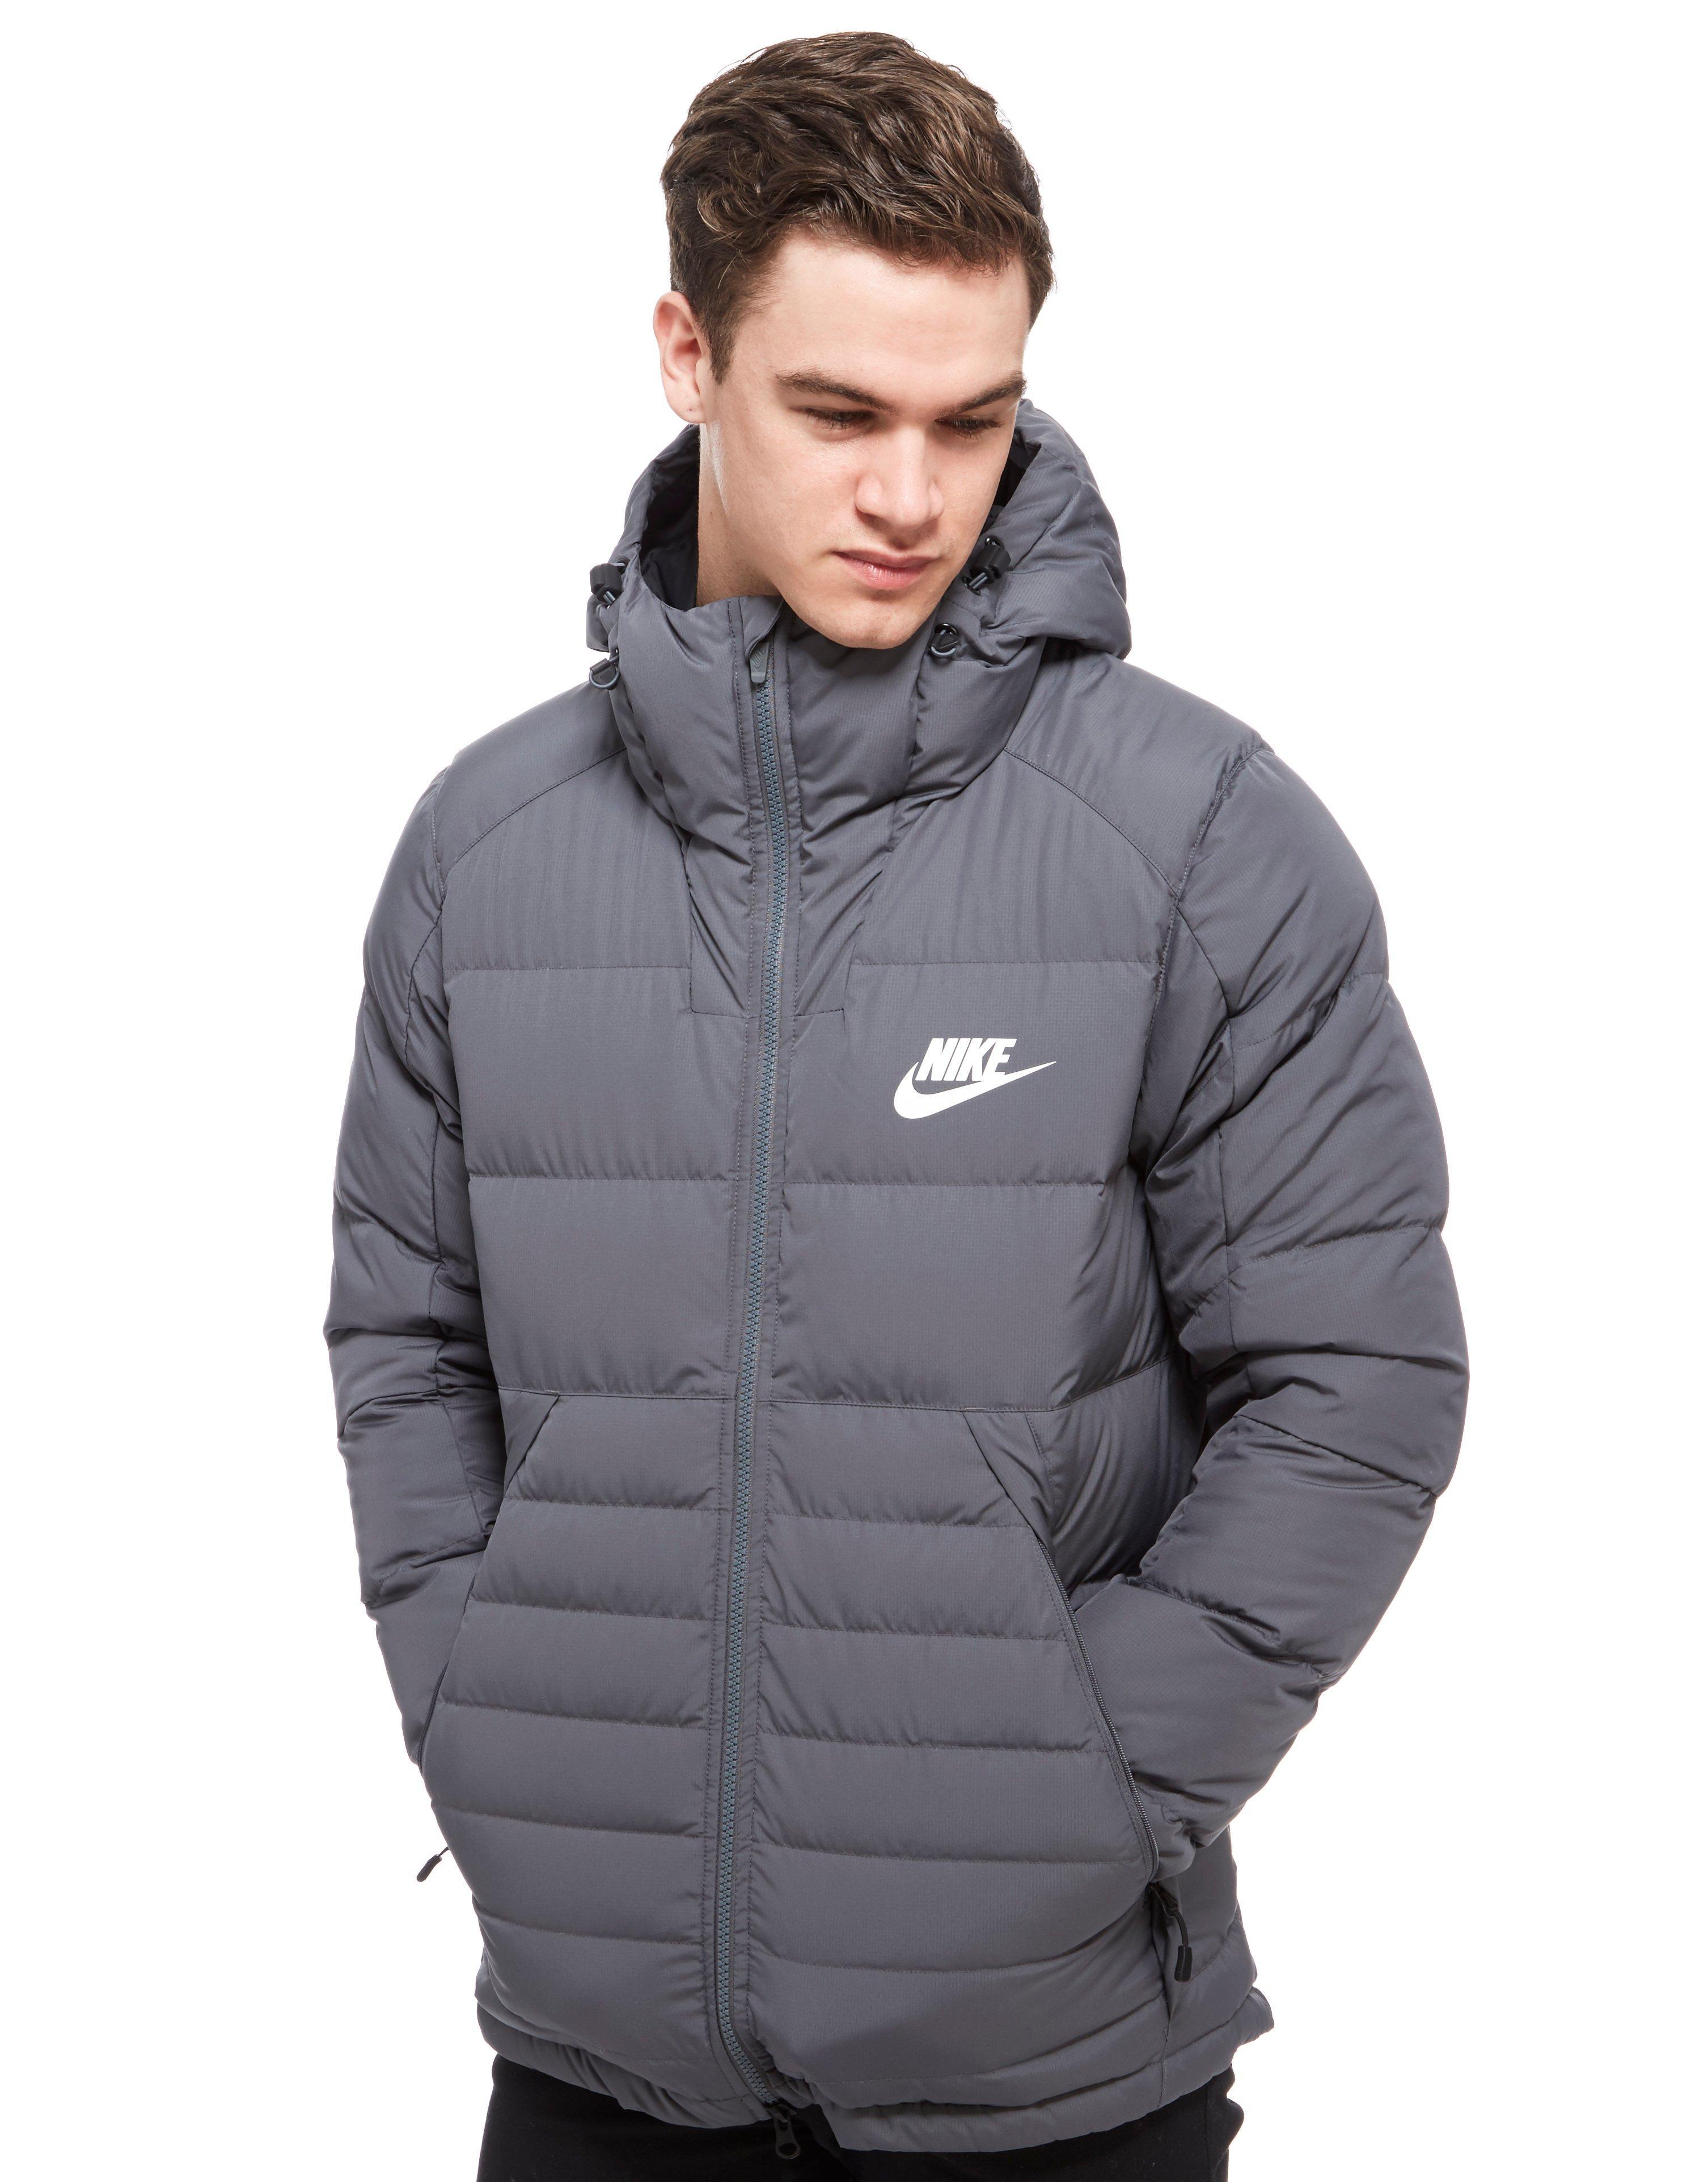 Nike Veste Dhiver Vente Au Royaume-uni